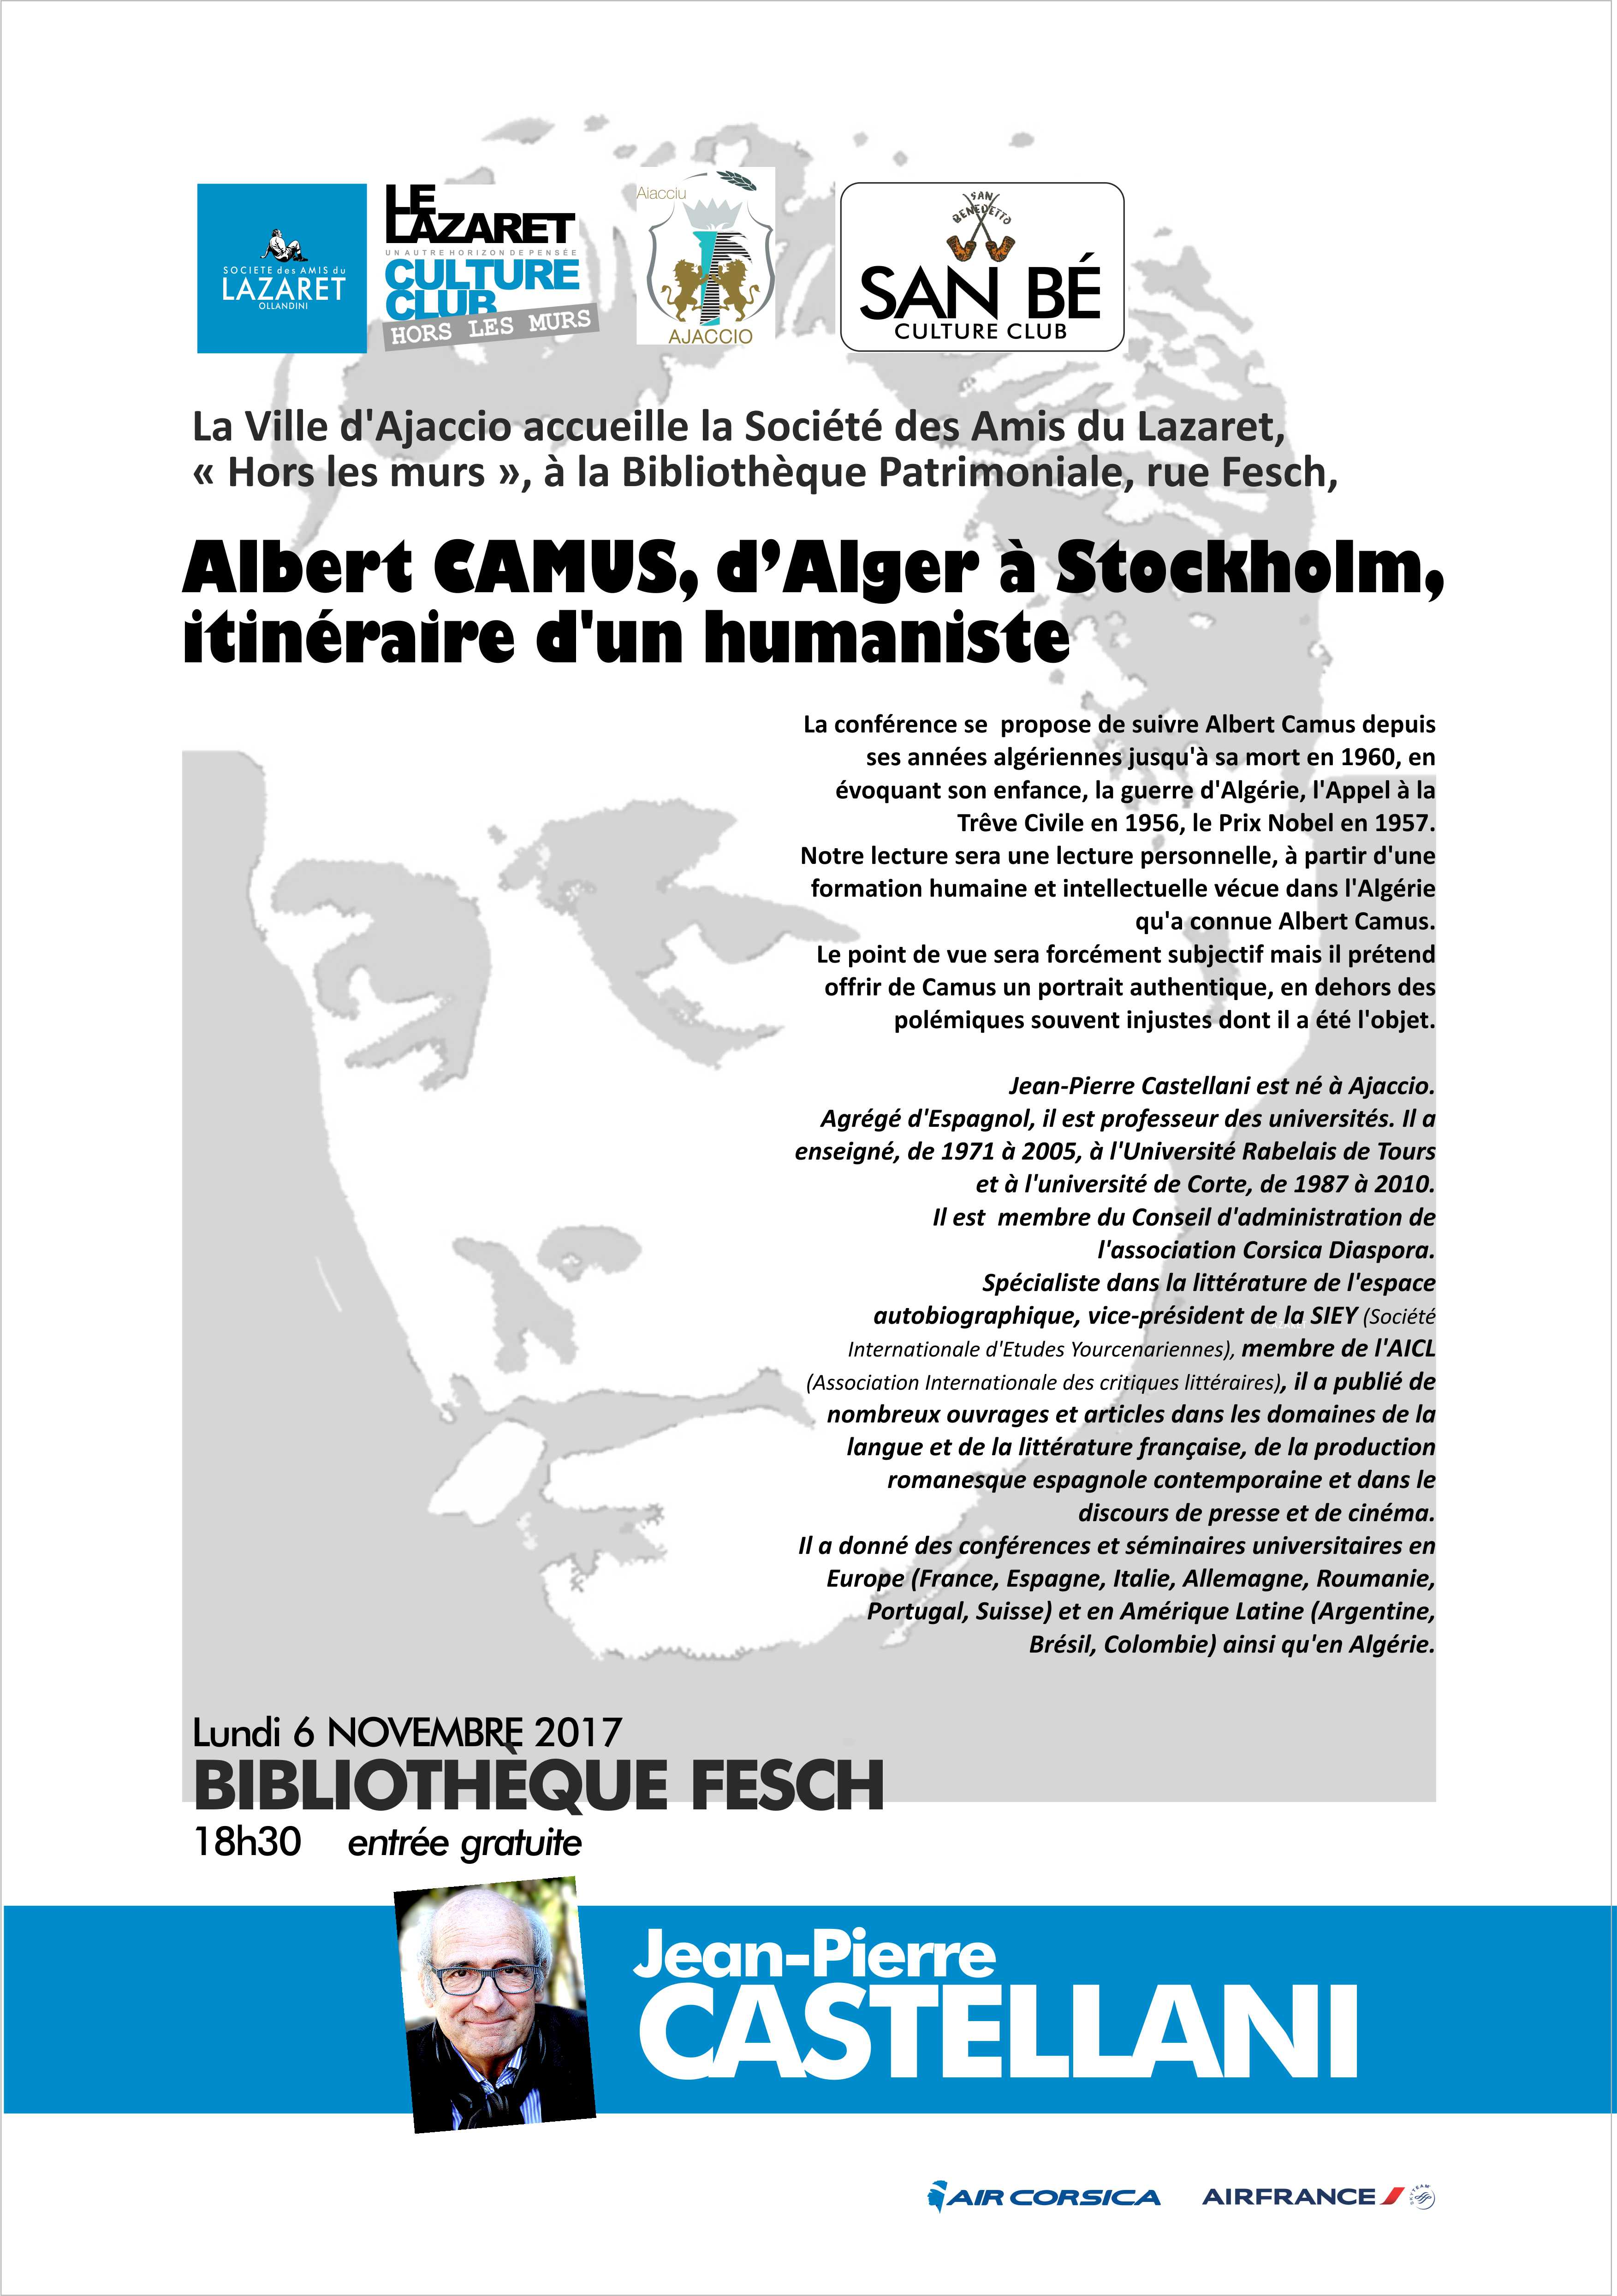 Conférence Jean-Pierre Castellani autour d'Albert Camus